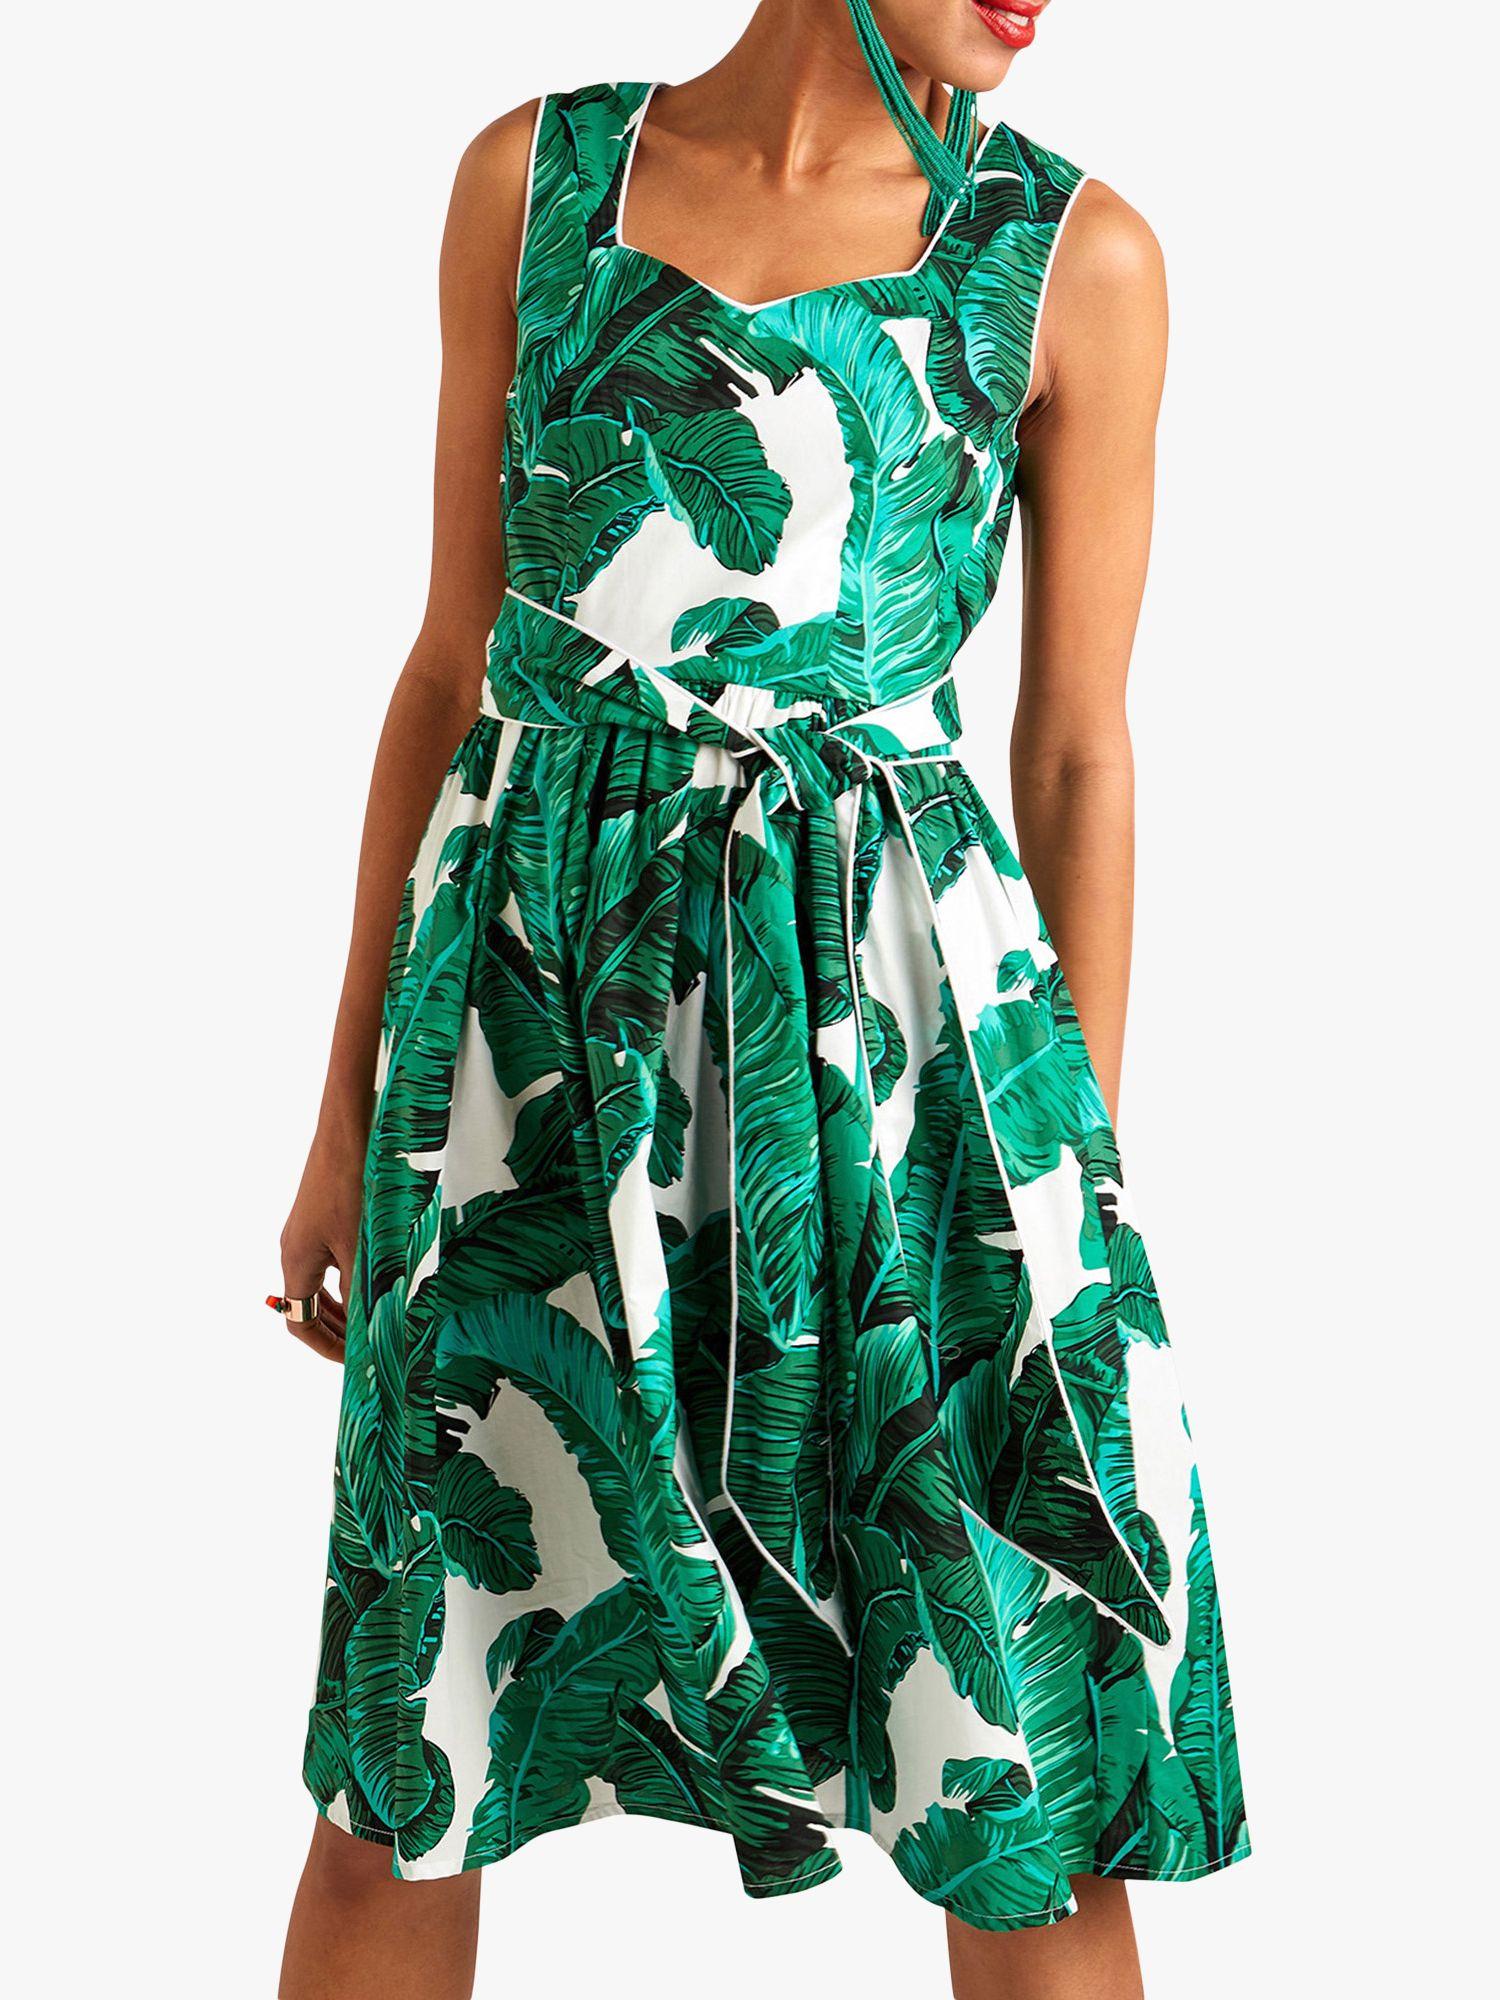 Yumi Yumi Palm Print Dress, Green